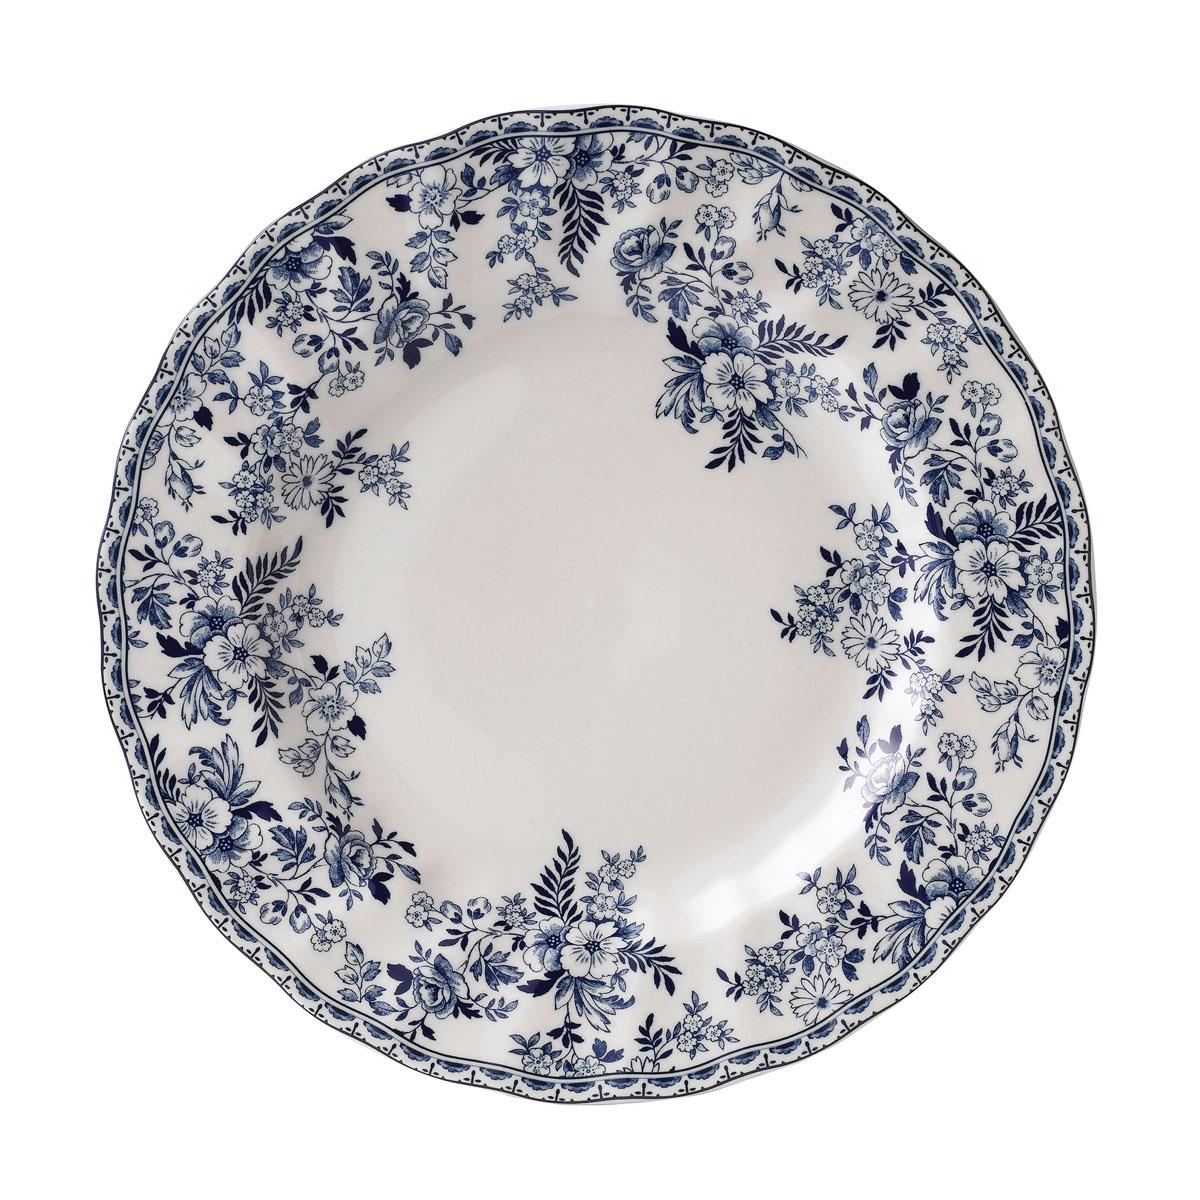 Johnson Brothers Devon Cottage Dinner Plate, Single